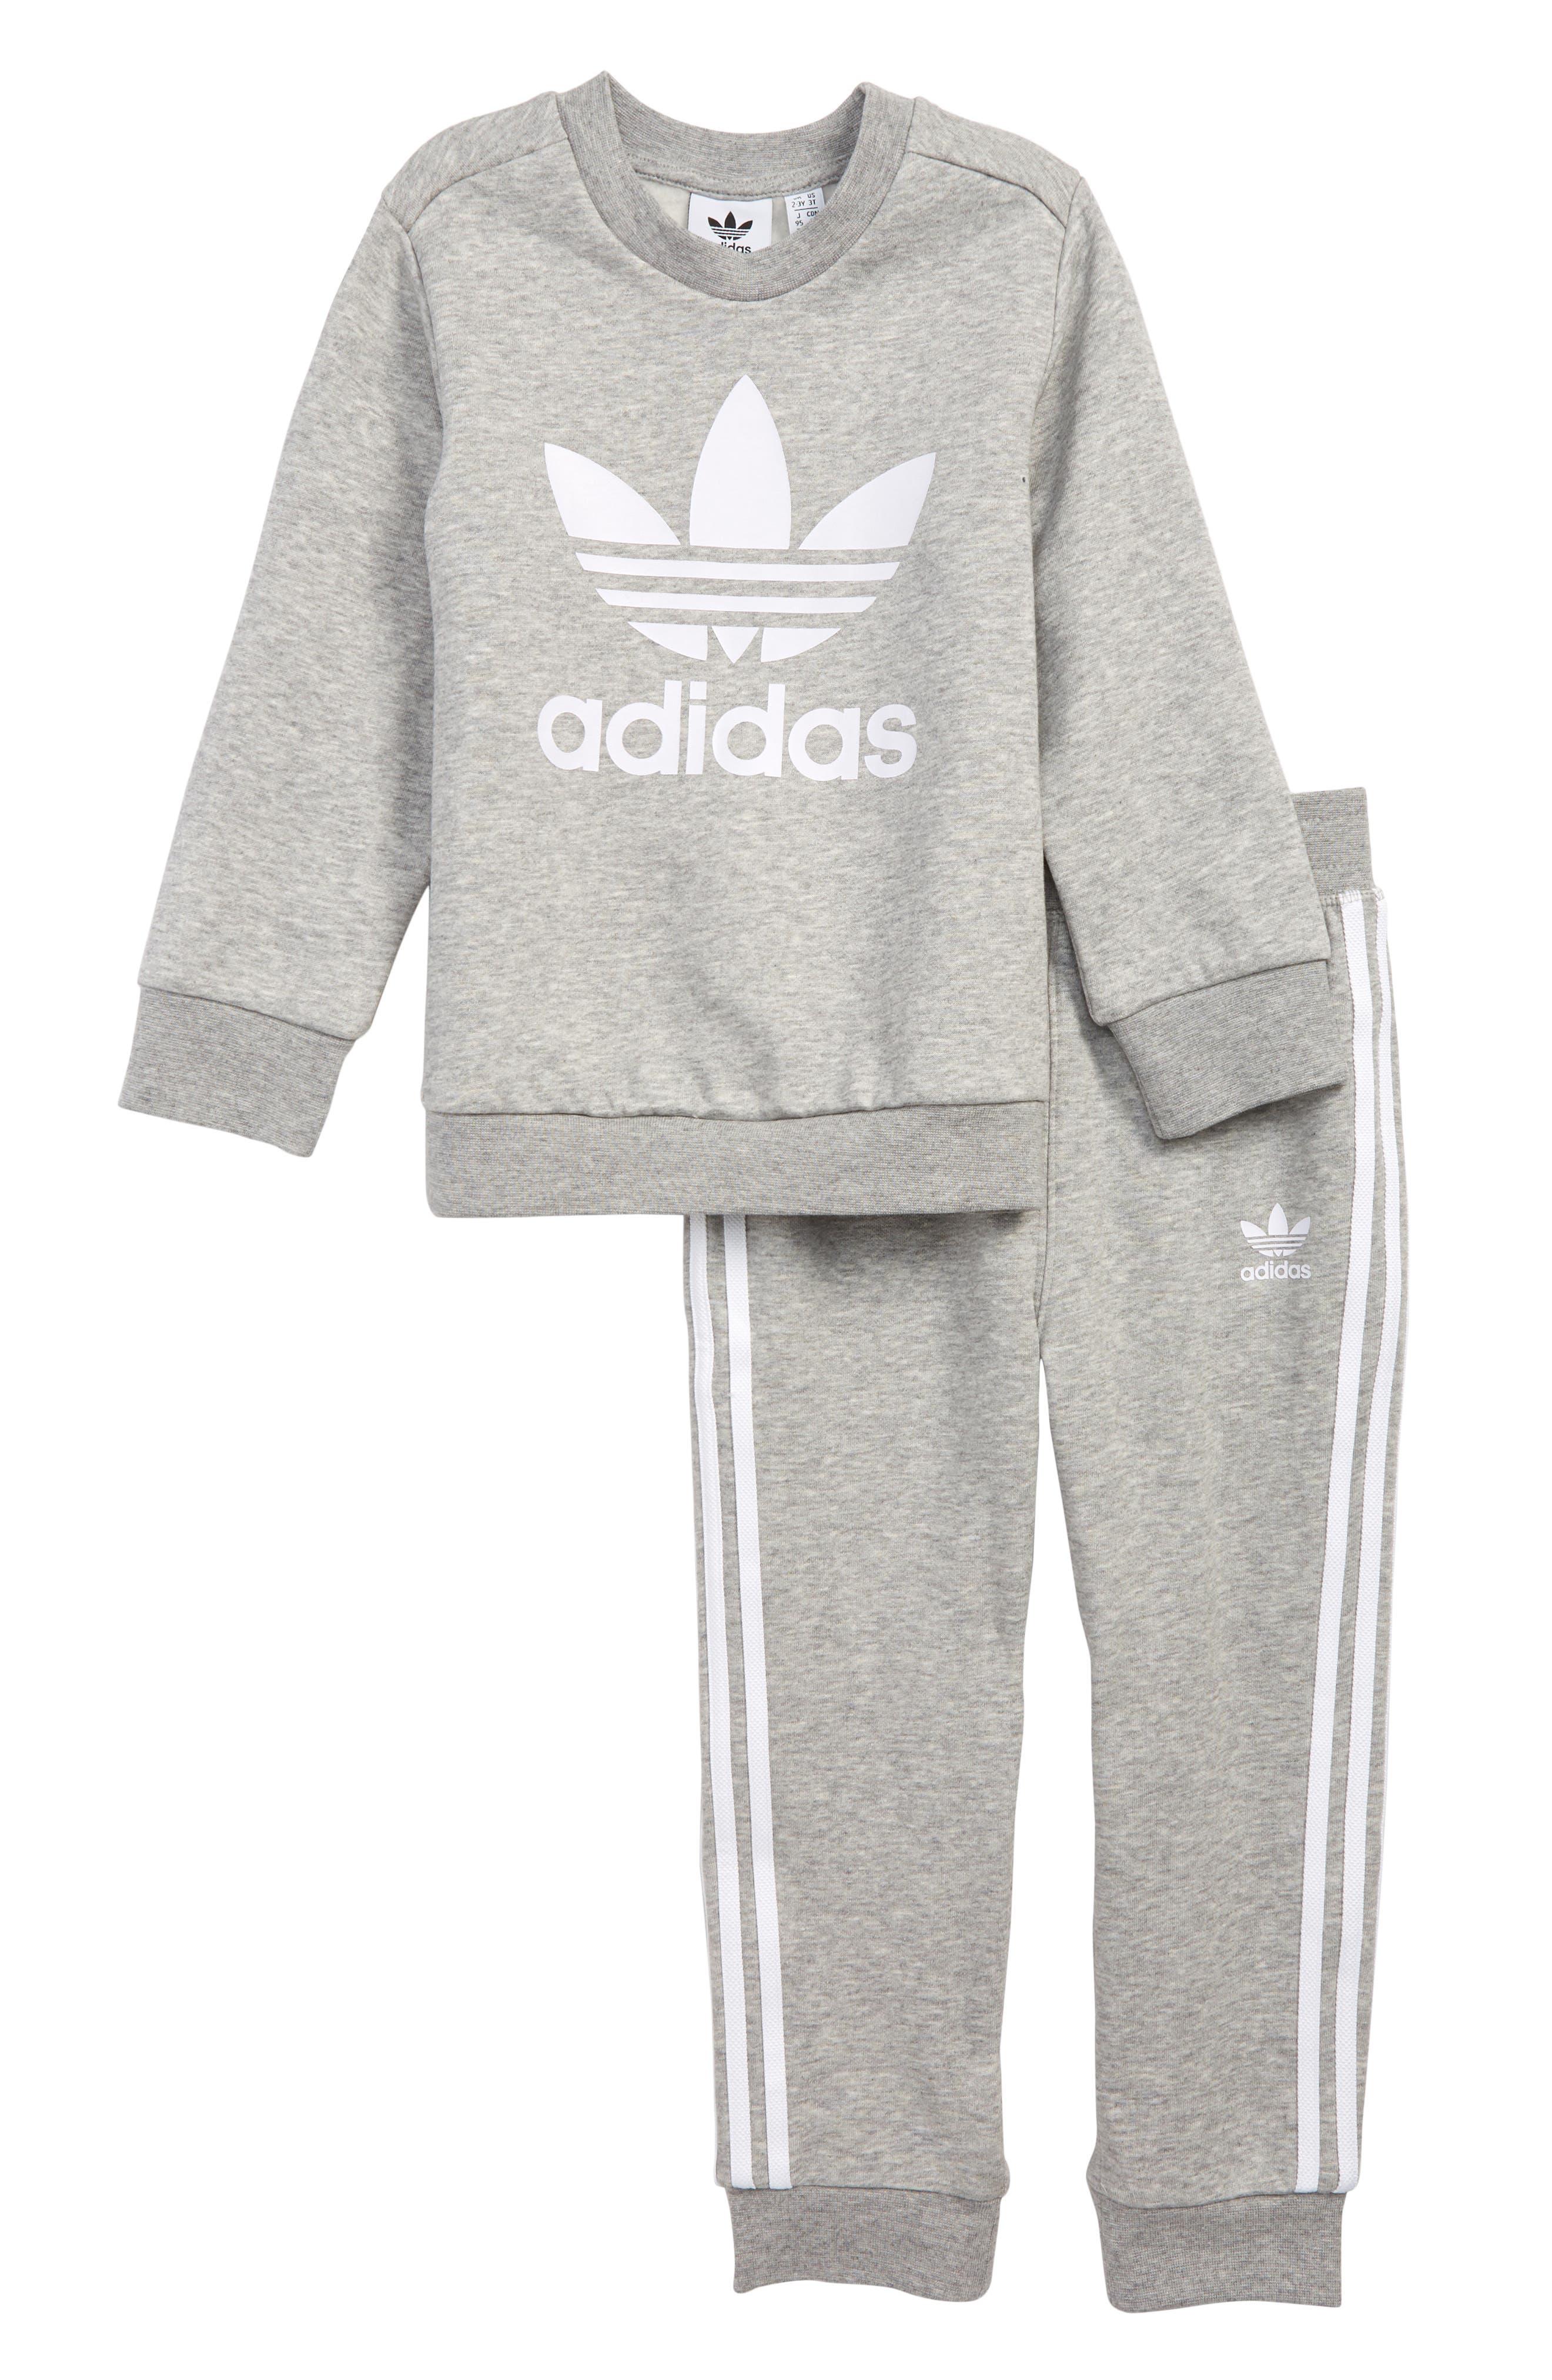 Toddler Boys Adidas Originals Logo Sweatshirt  Sweatpants Set